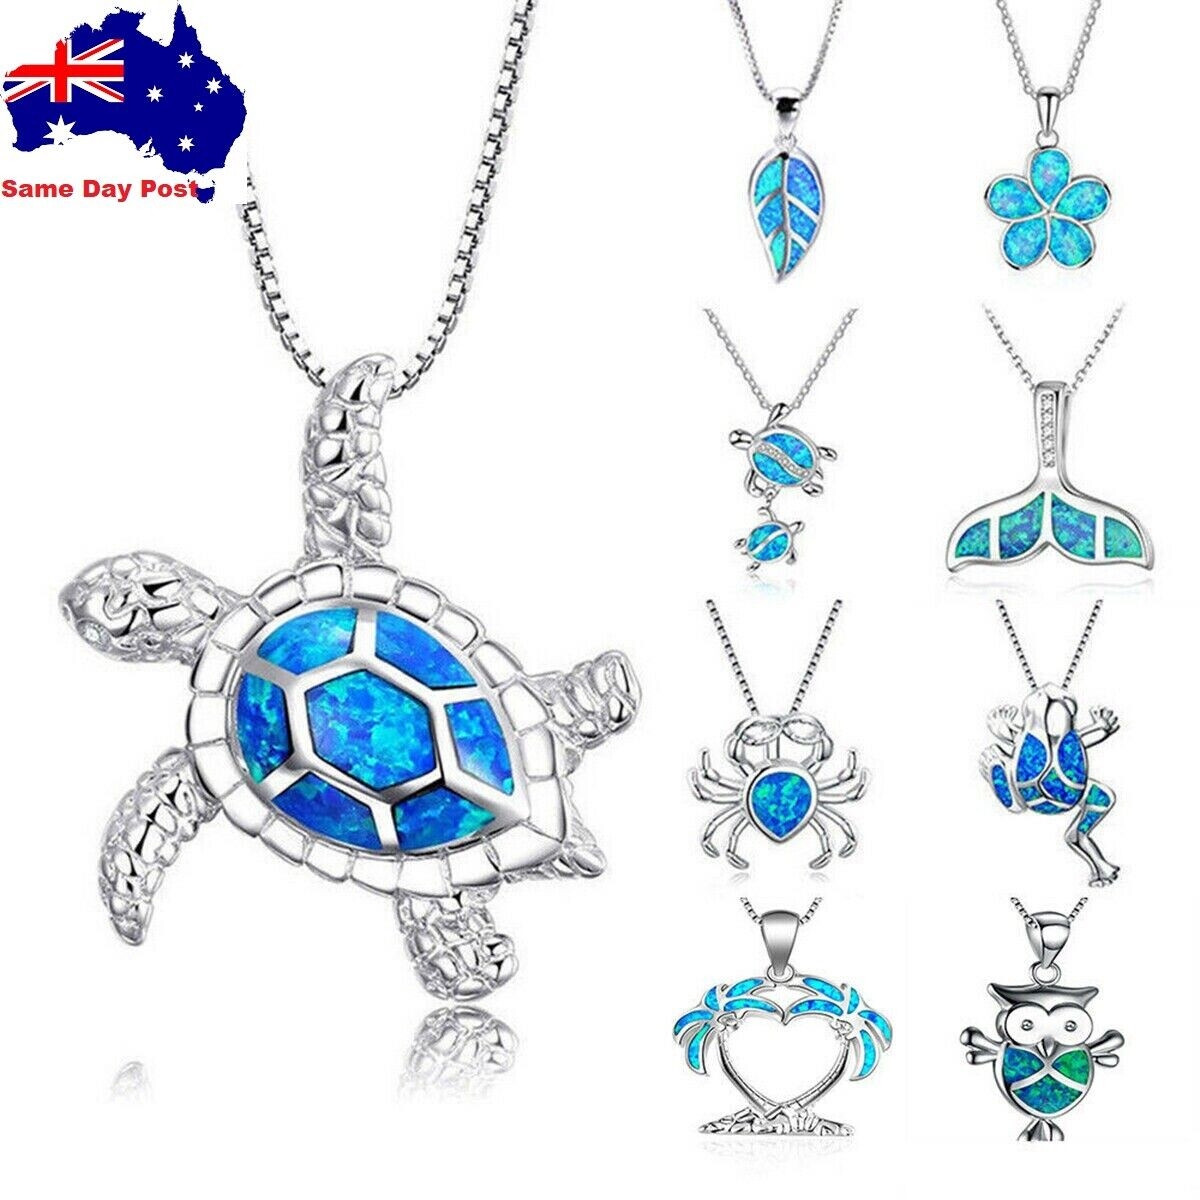 Jewellery - Cute Sea Animal Turtle Pendant Necklace Silver Blue Fire Opal Jewelry Gift Chain